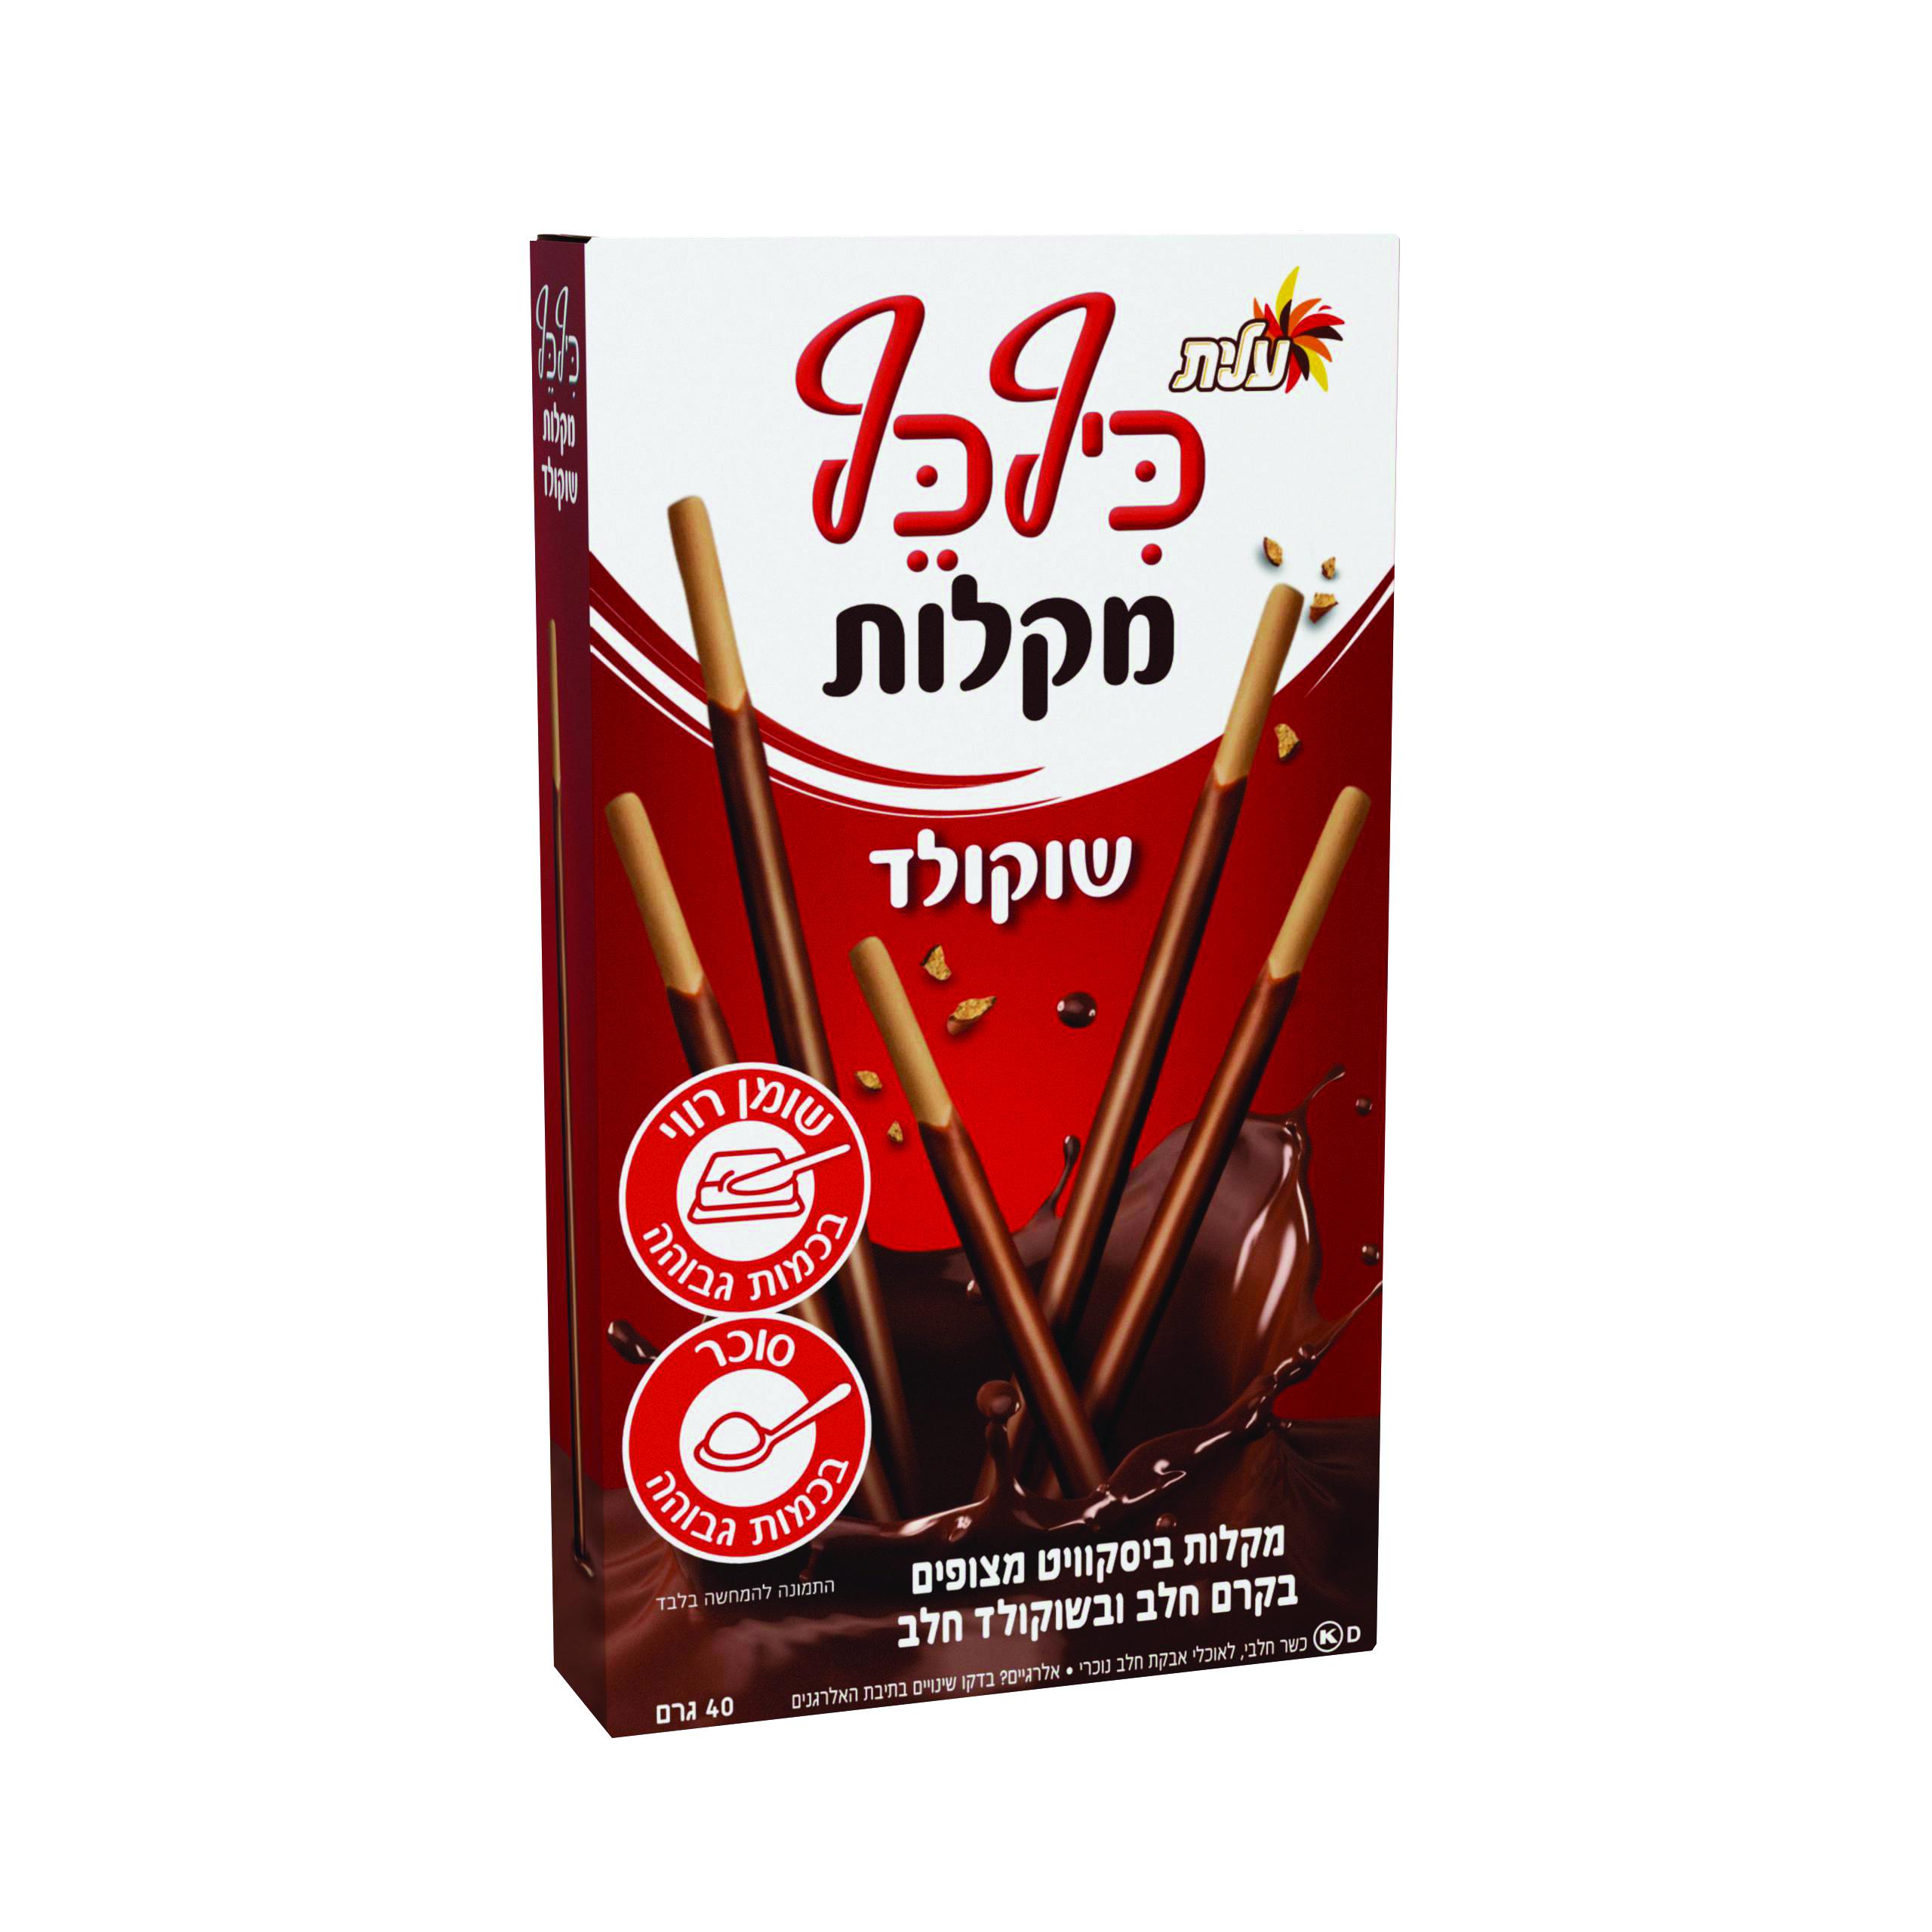 Kif Kef Sticks - Chocolate